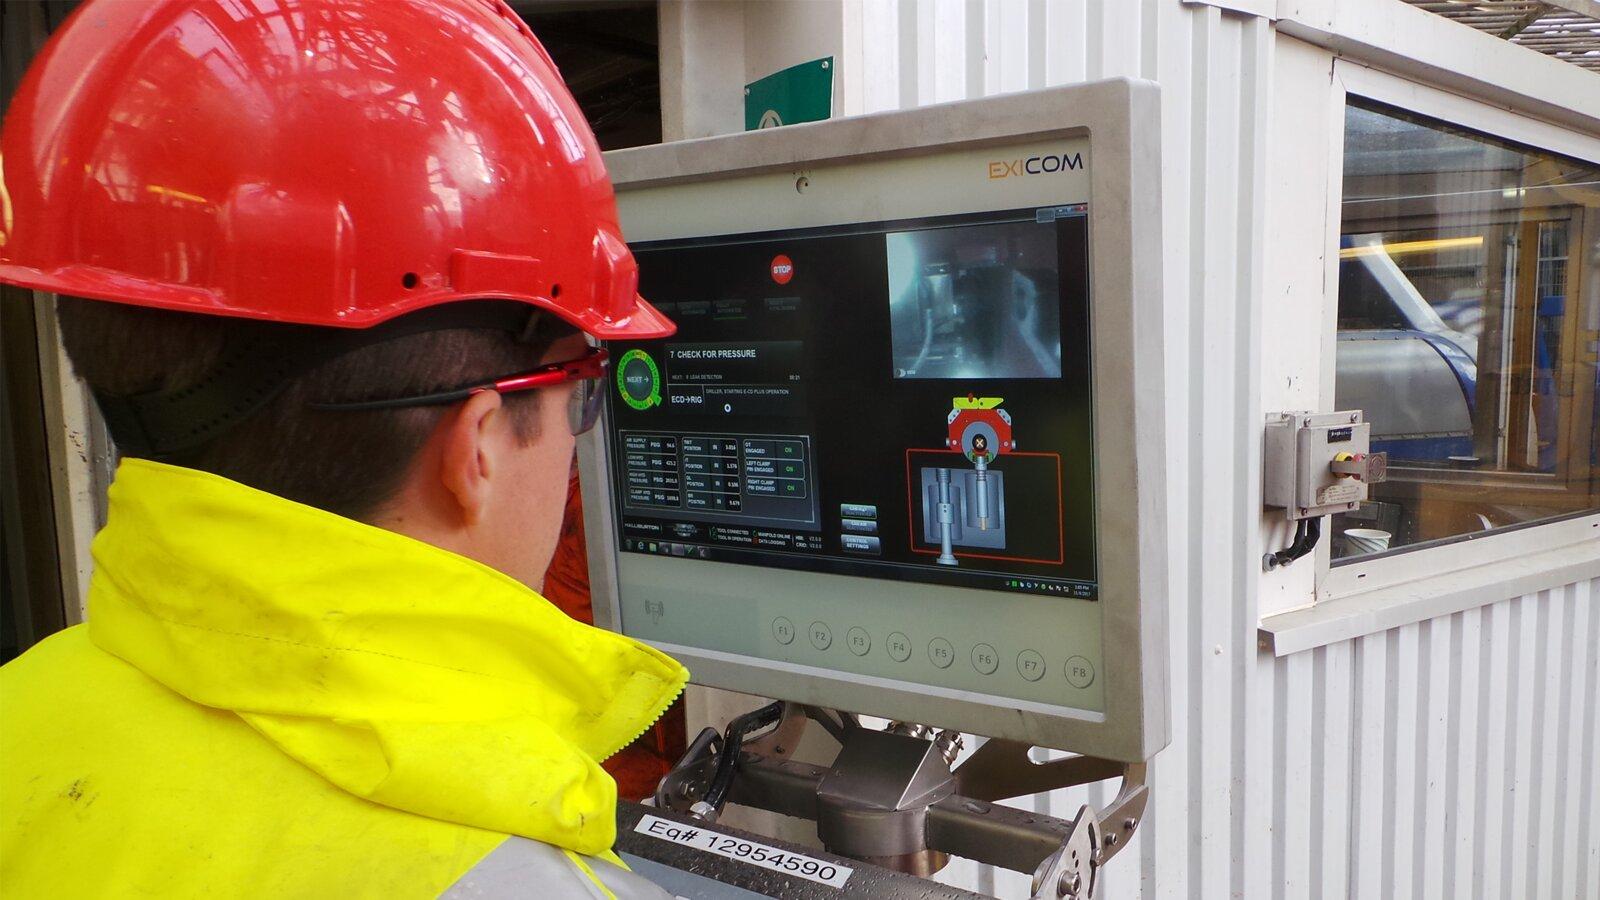 HMI Panel to control e-cd Plus equipment